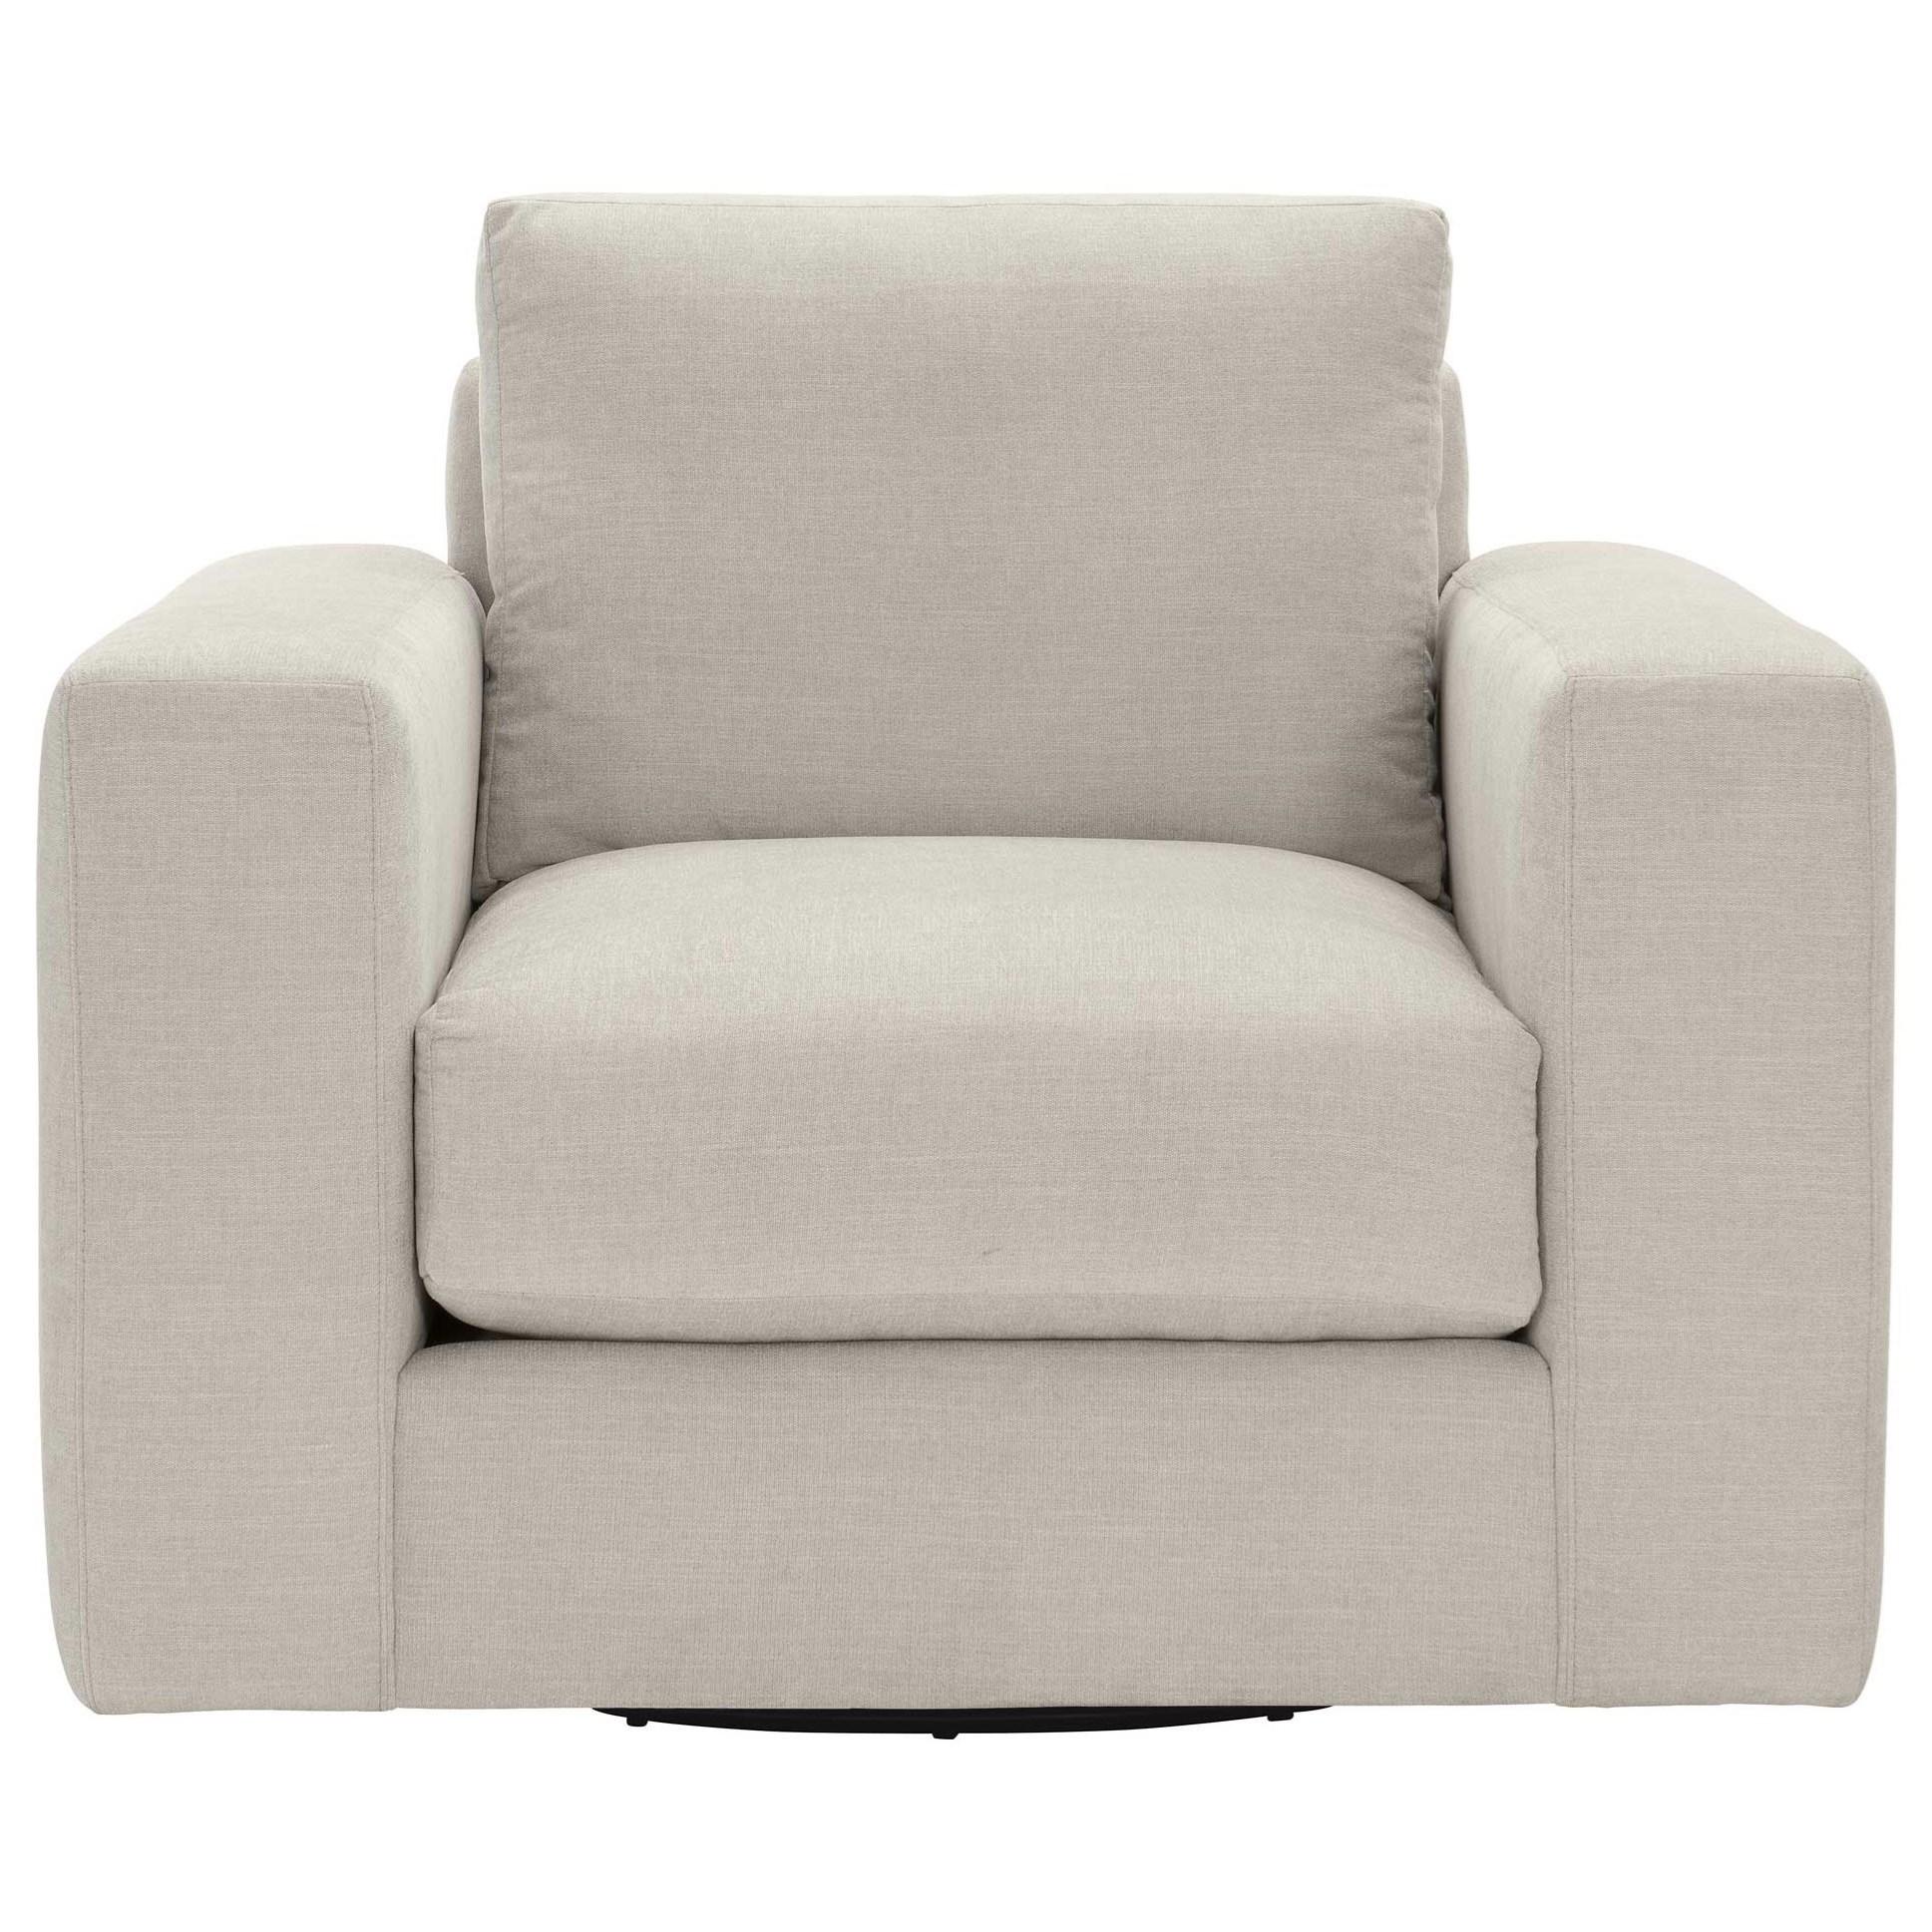 Drew Swivel Chair by Bernhardt at Dream Home Interiors